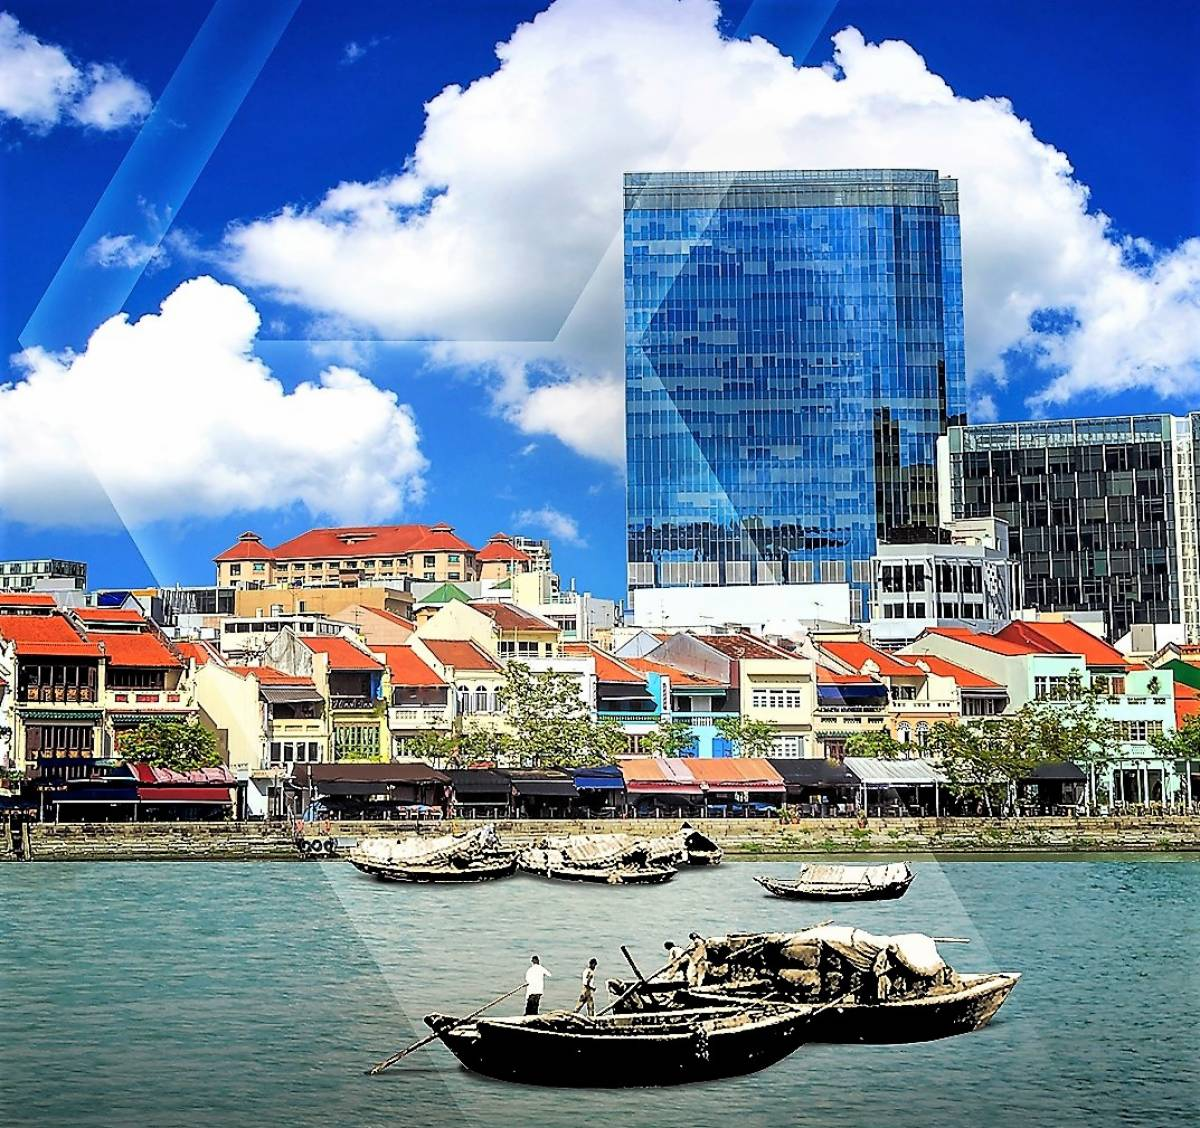 Travel Bubble Proposed for Singapore, Riau Islands and Desaru Coast